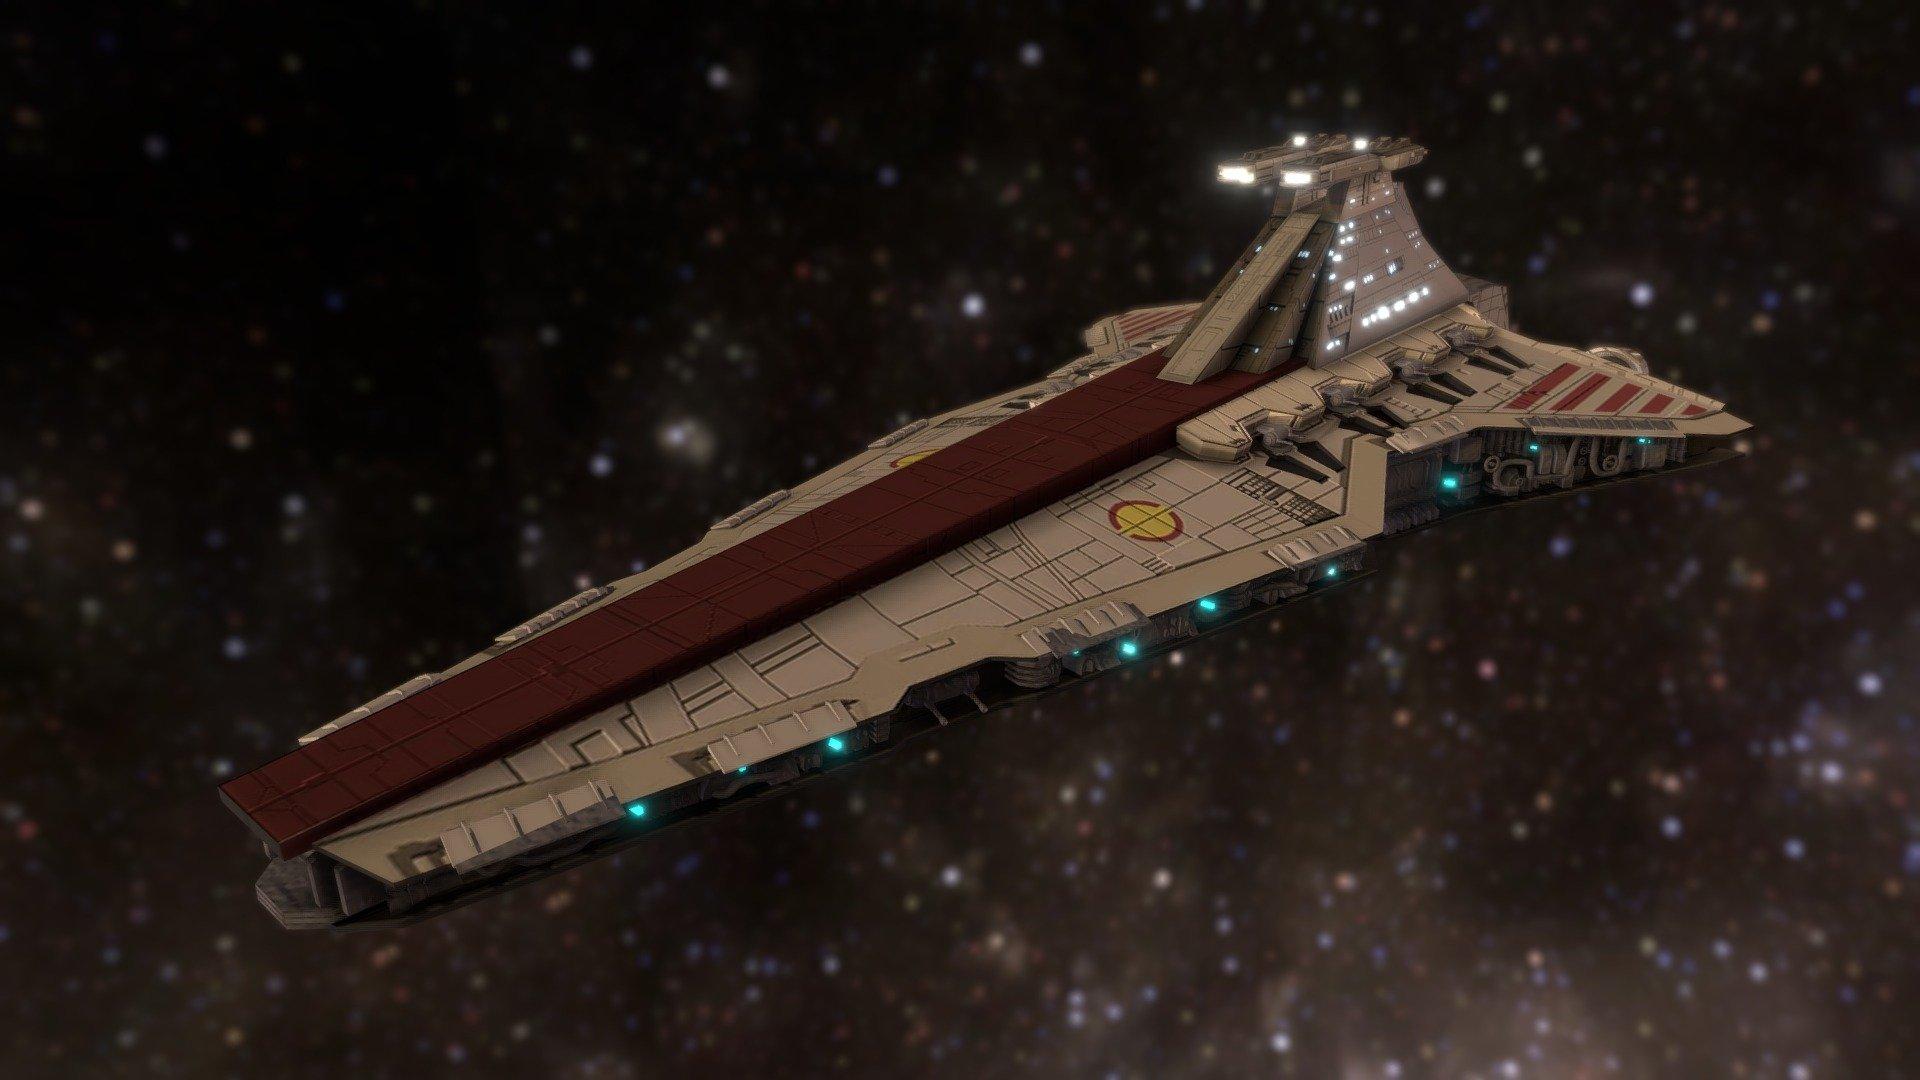 Venator Class Star Destroyer 3d Model By Roger Masats Vidal